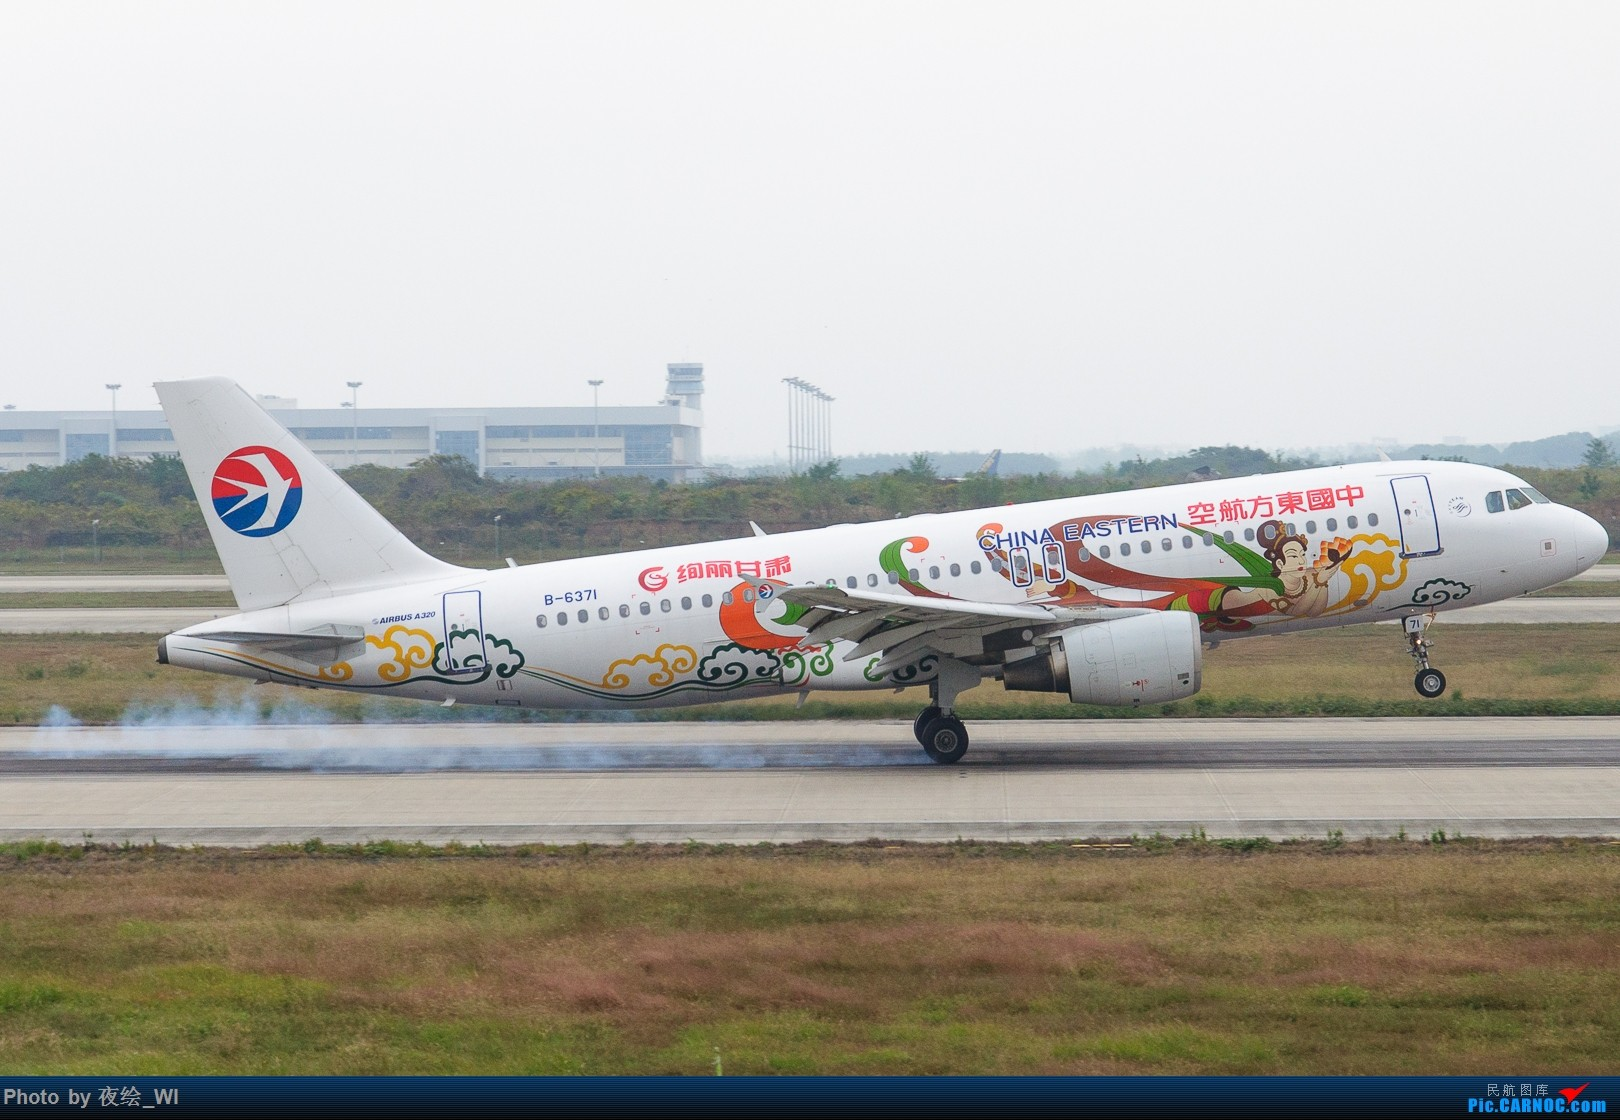 Re:[原创]【NKG】生日也要拍飞机,珍惜南京久违的单跑运行时光 AIRBUS A320-200 B-6371 中国南京禄口国际机场